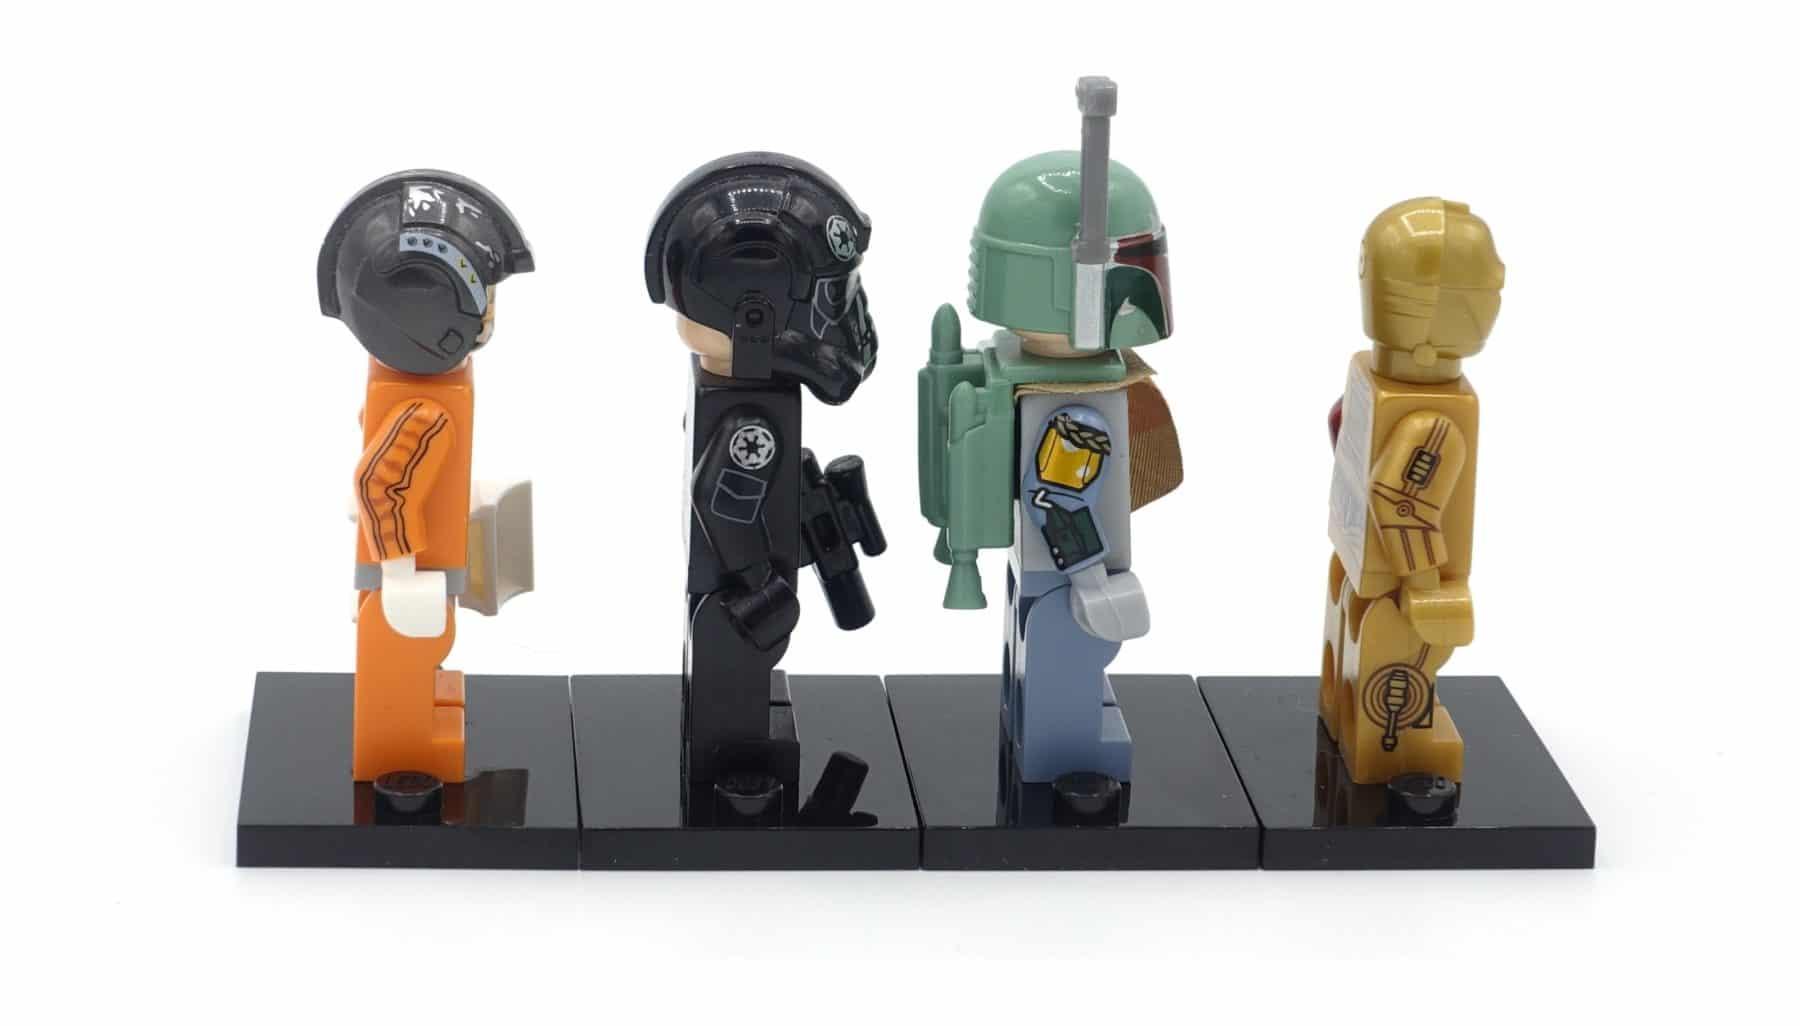 Bedruckte Arme bei LEGO Star Wars Minifiguren